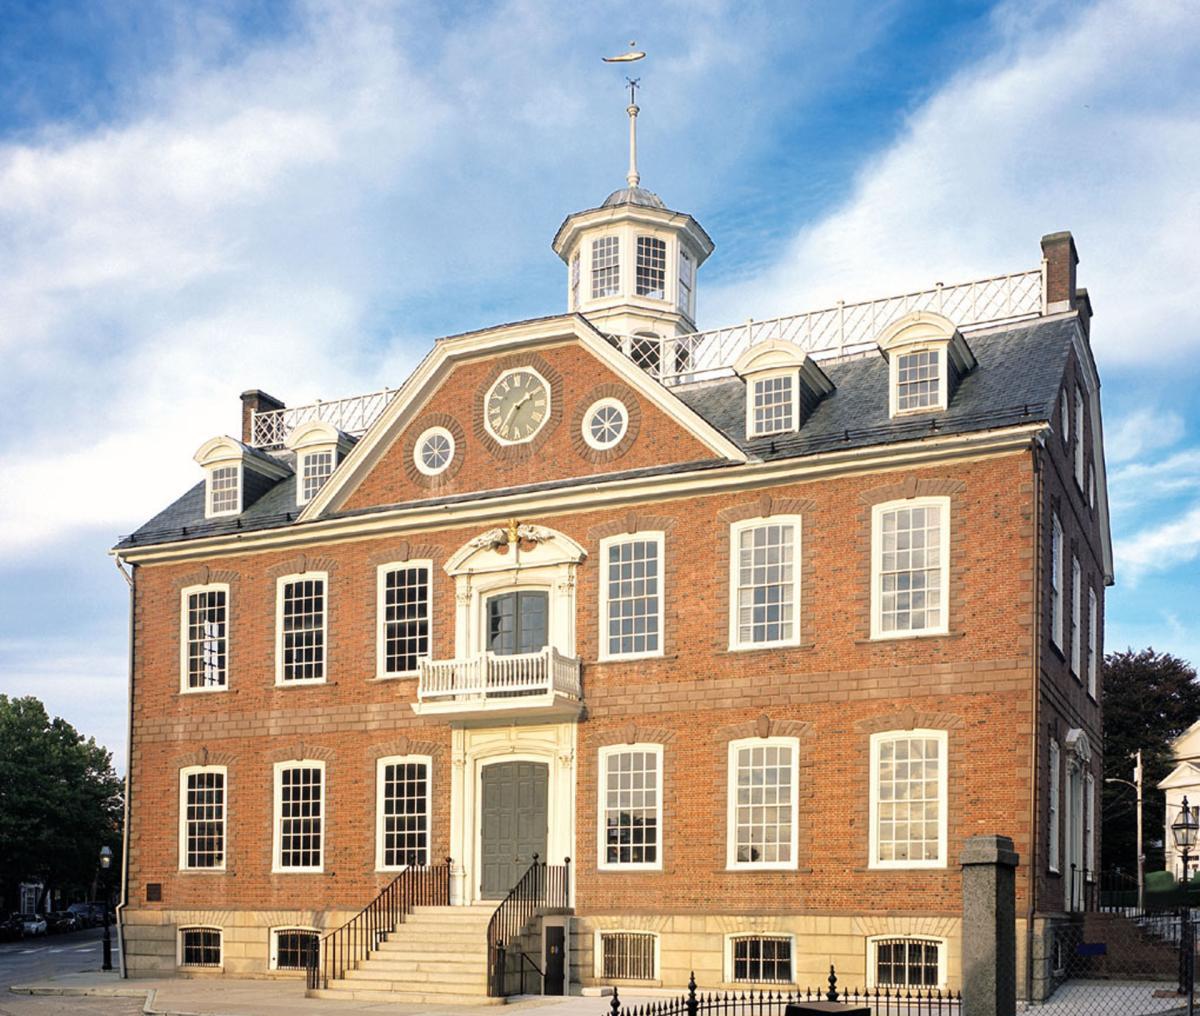 colony-house-exterior_credit-newport-historical-society.jpg